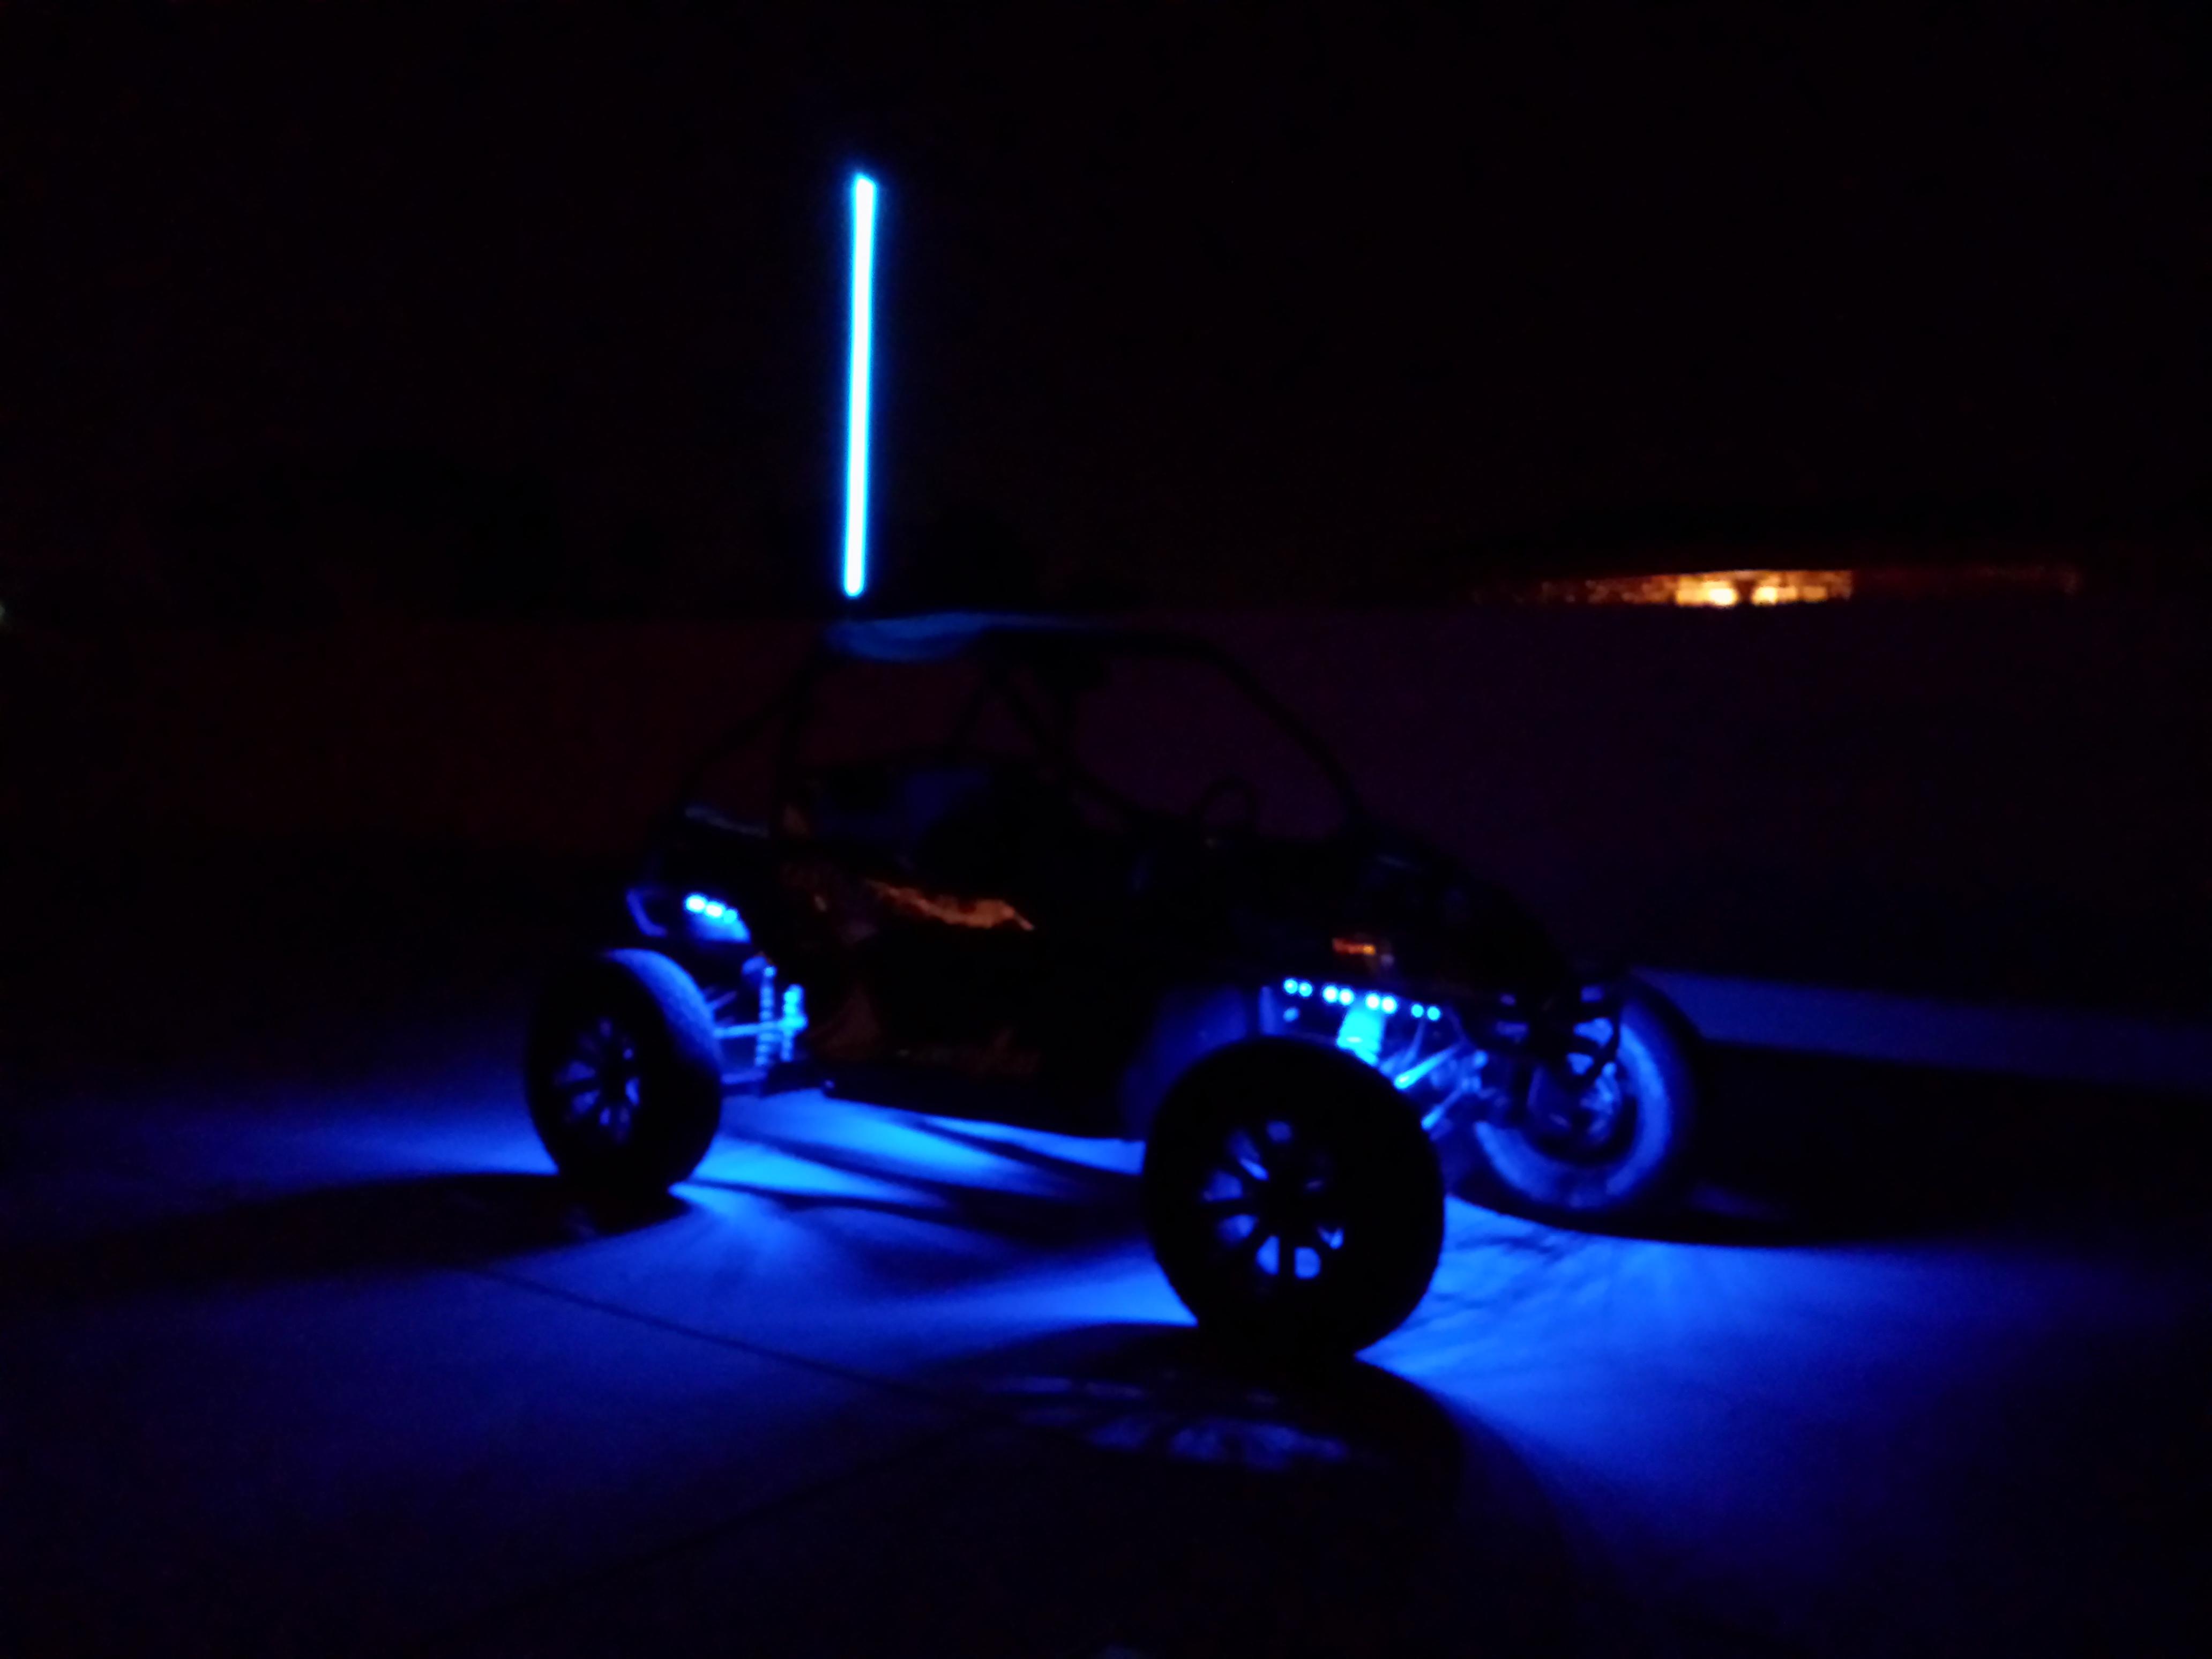 Utv inc quick light fiber optic led whip - 4'